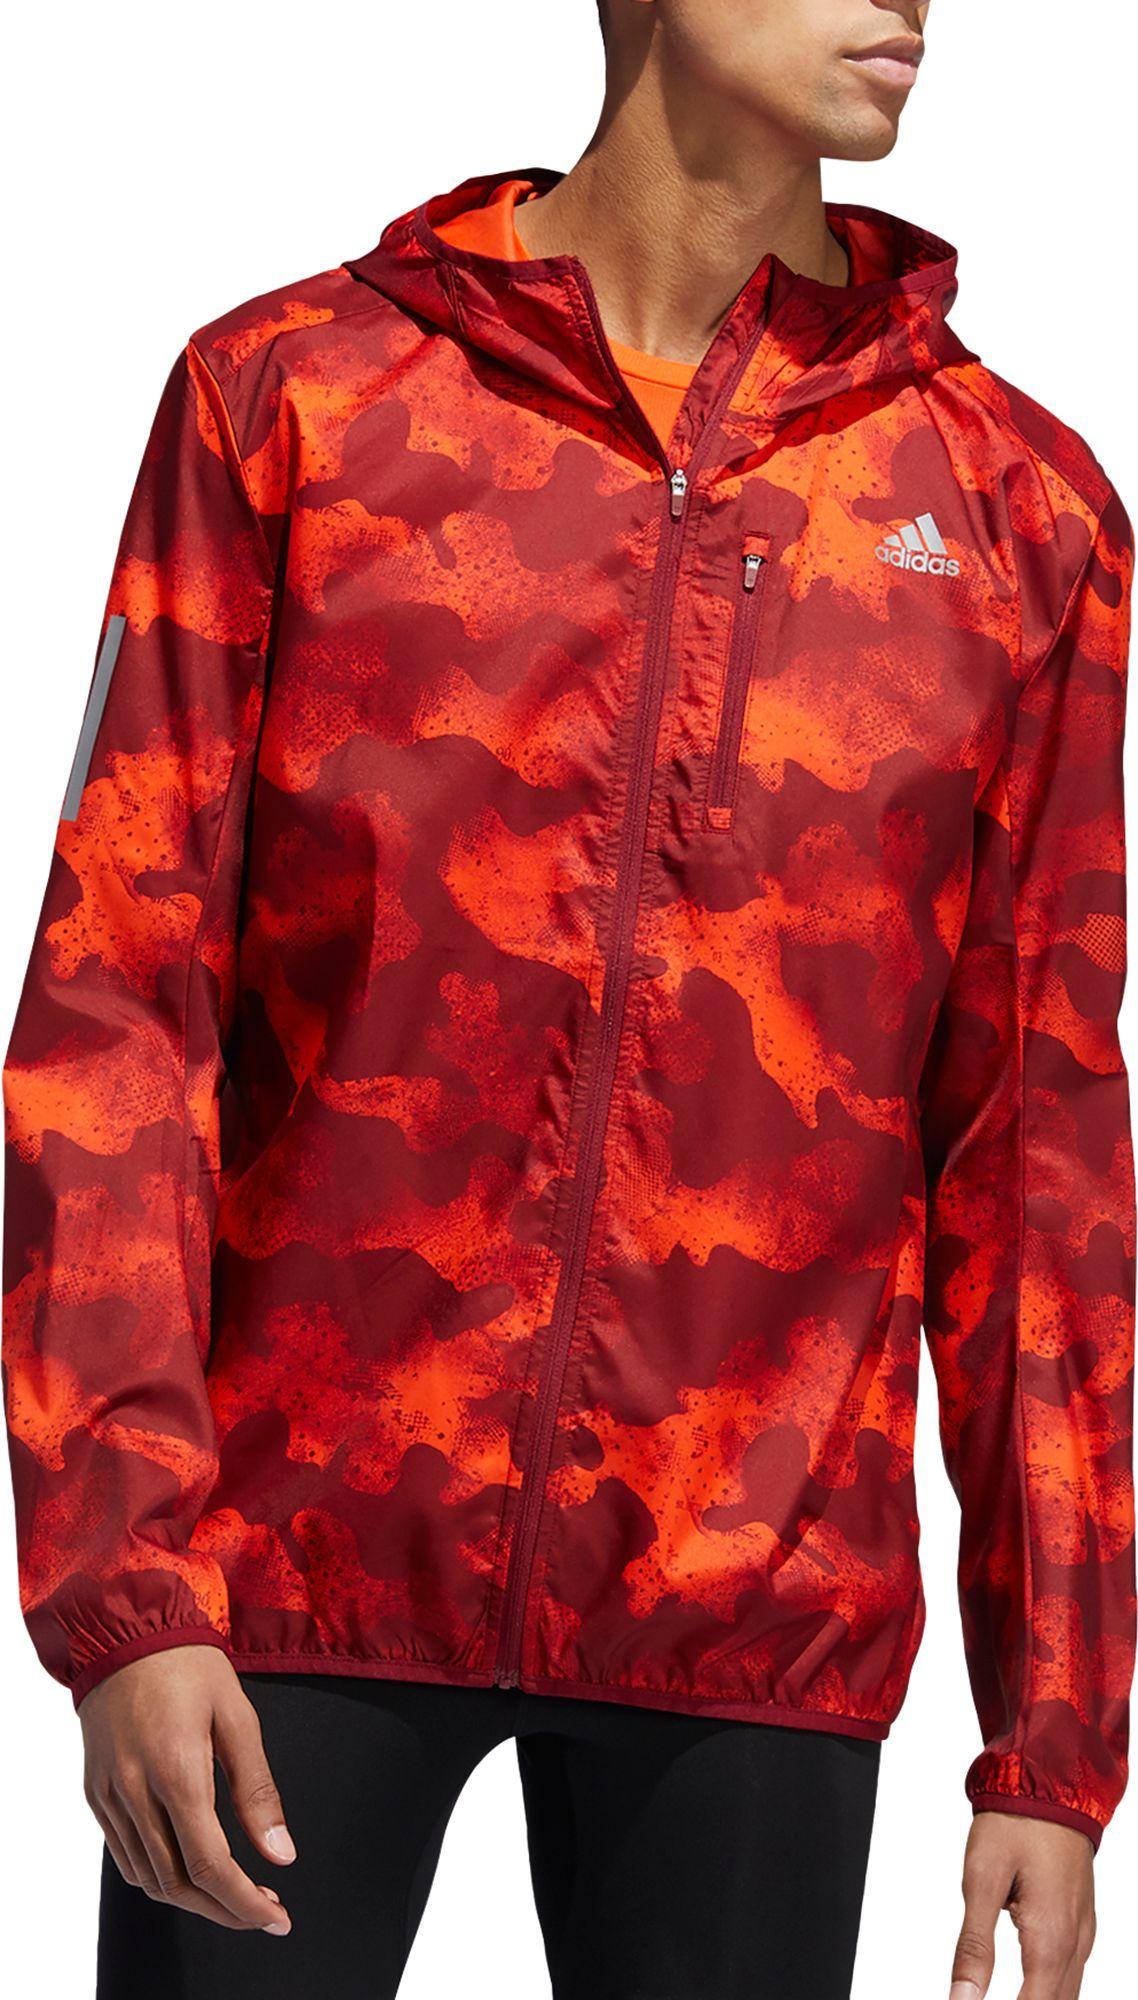 Adidas Men S Own The Run Camouflage Running Jacket Size Xl Activ Org Act Mrn Col Bur Running Jacket Adidas Men Jackets [ 2000 x 1138 Pixel ]